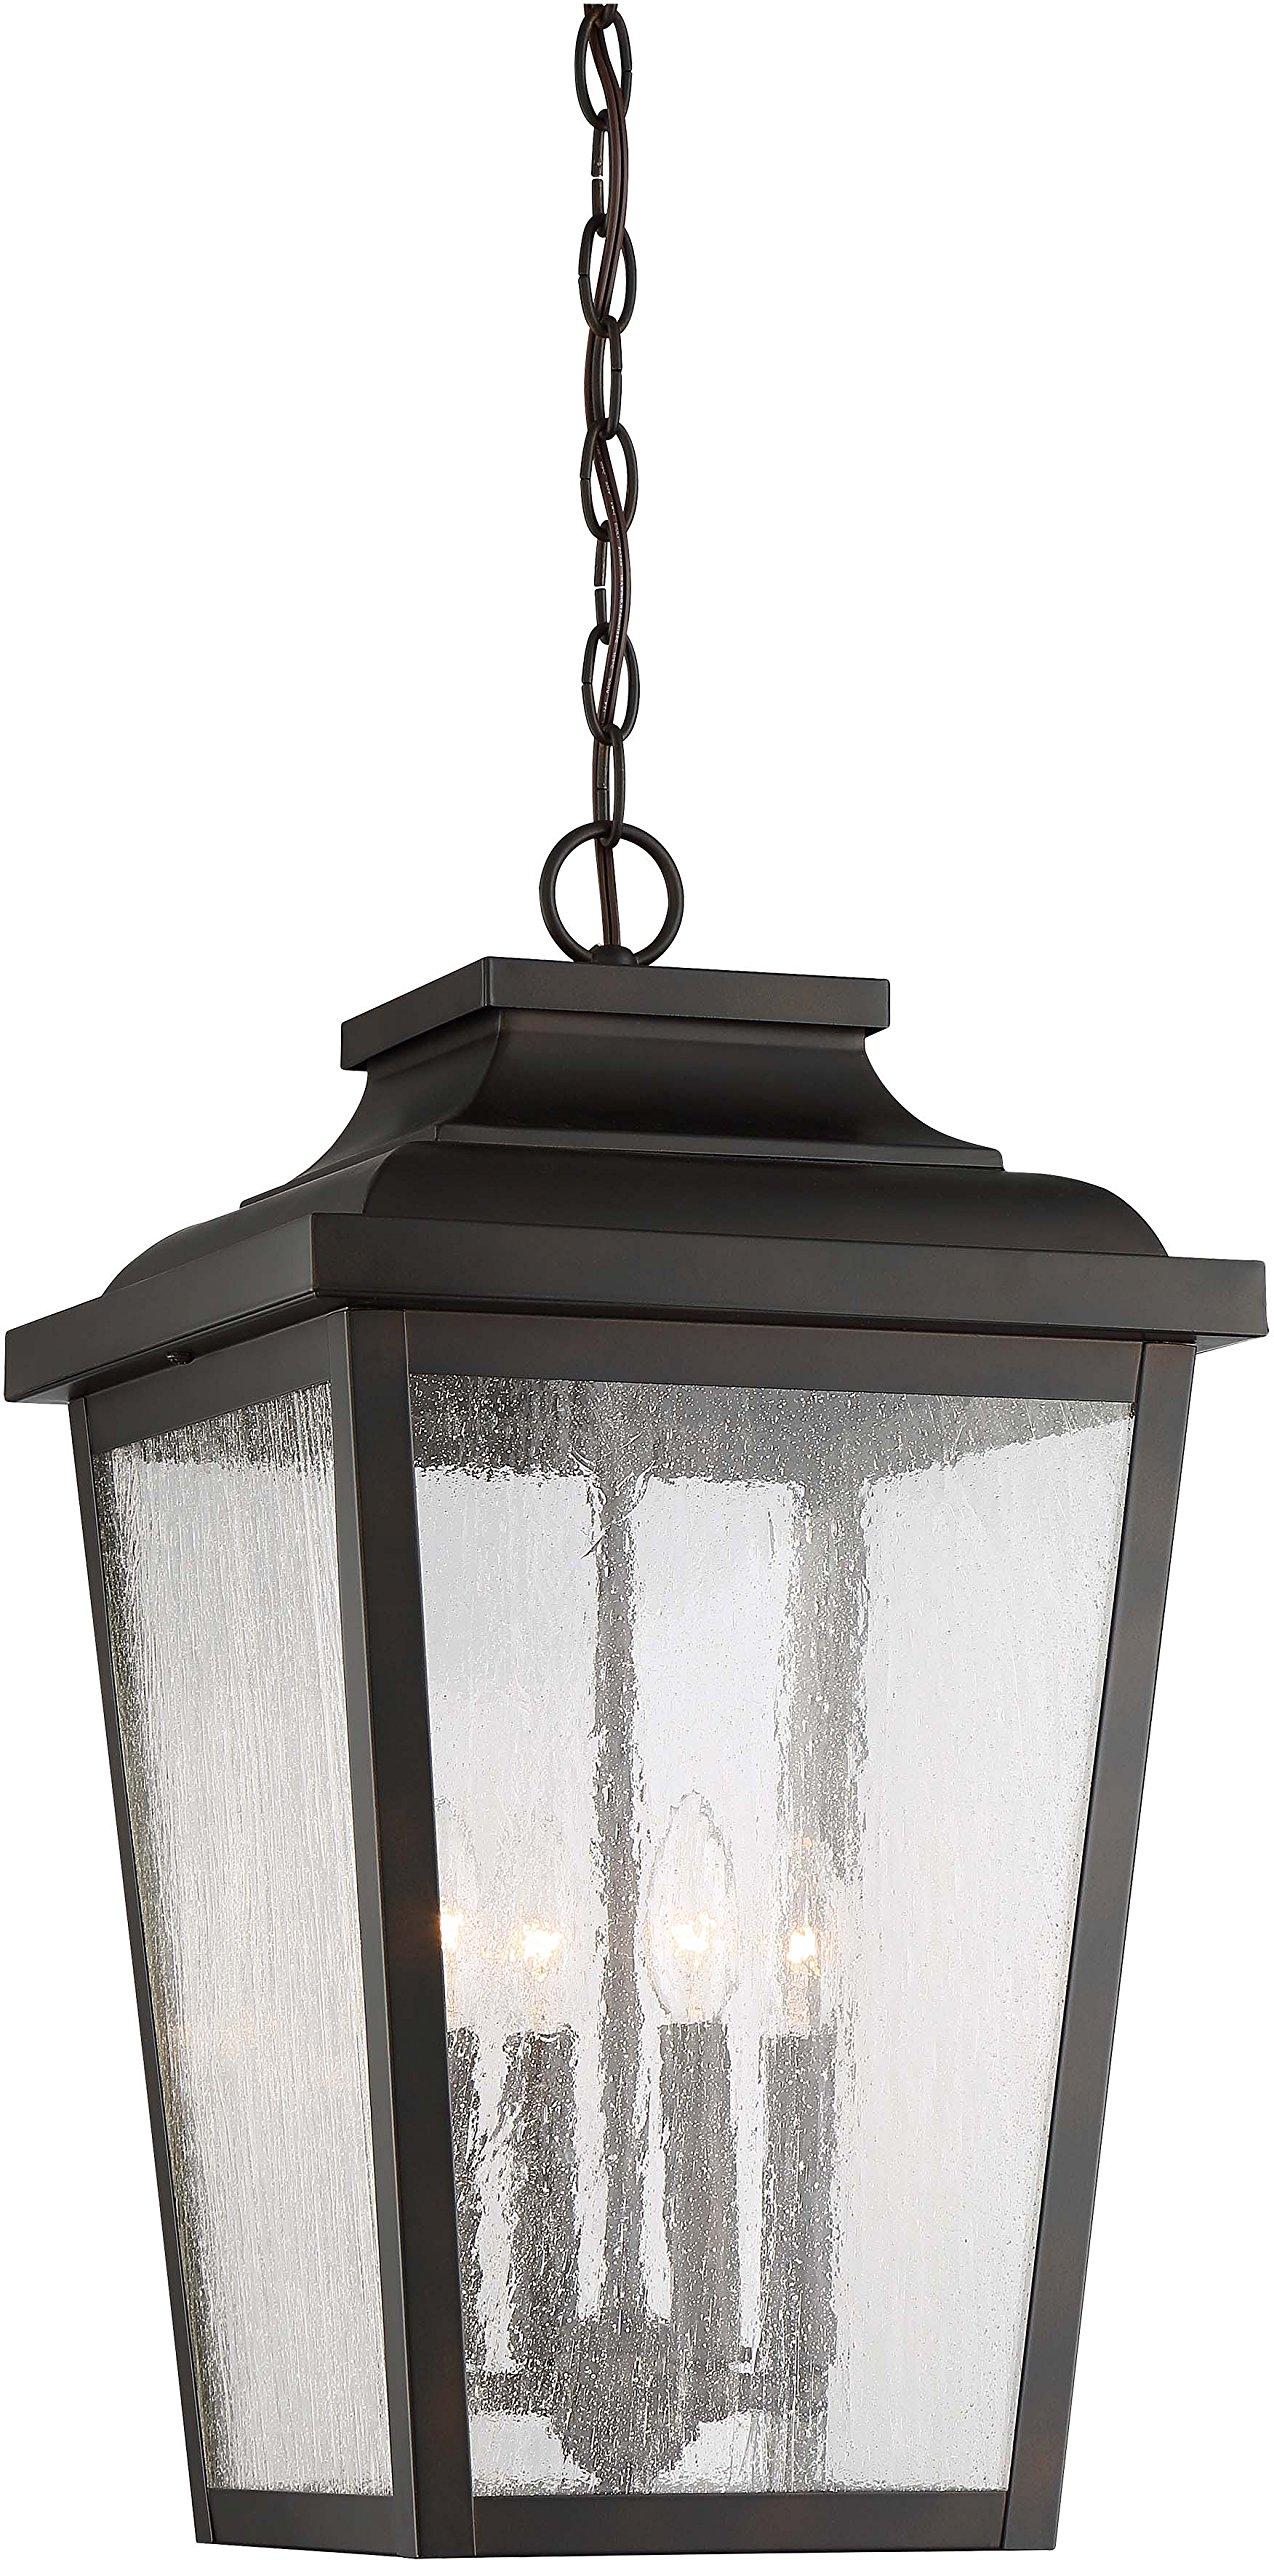 Minka Lavery Outdoor Pendant Lighting 72175-189 Irvington Manor, 4-Light 240 Watts, Chelesa Bronze